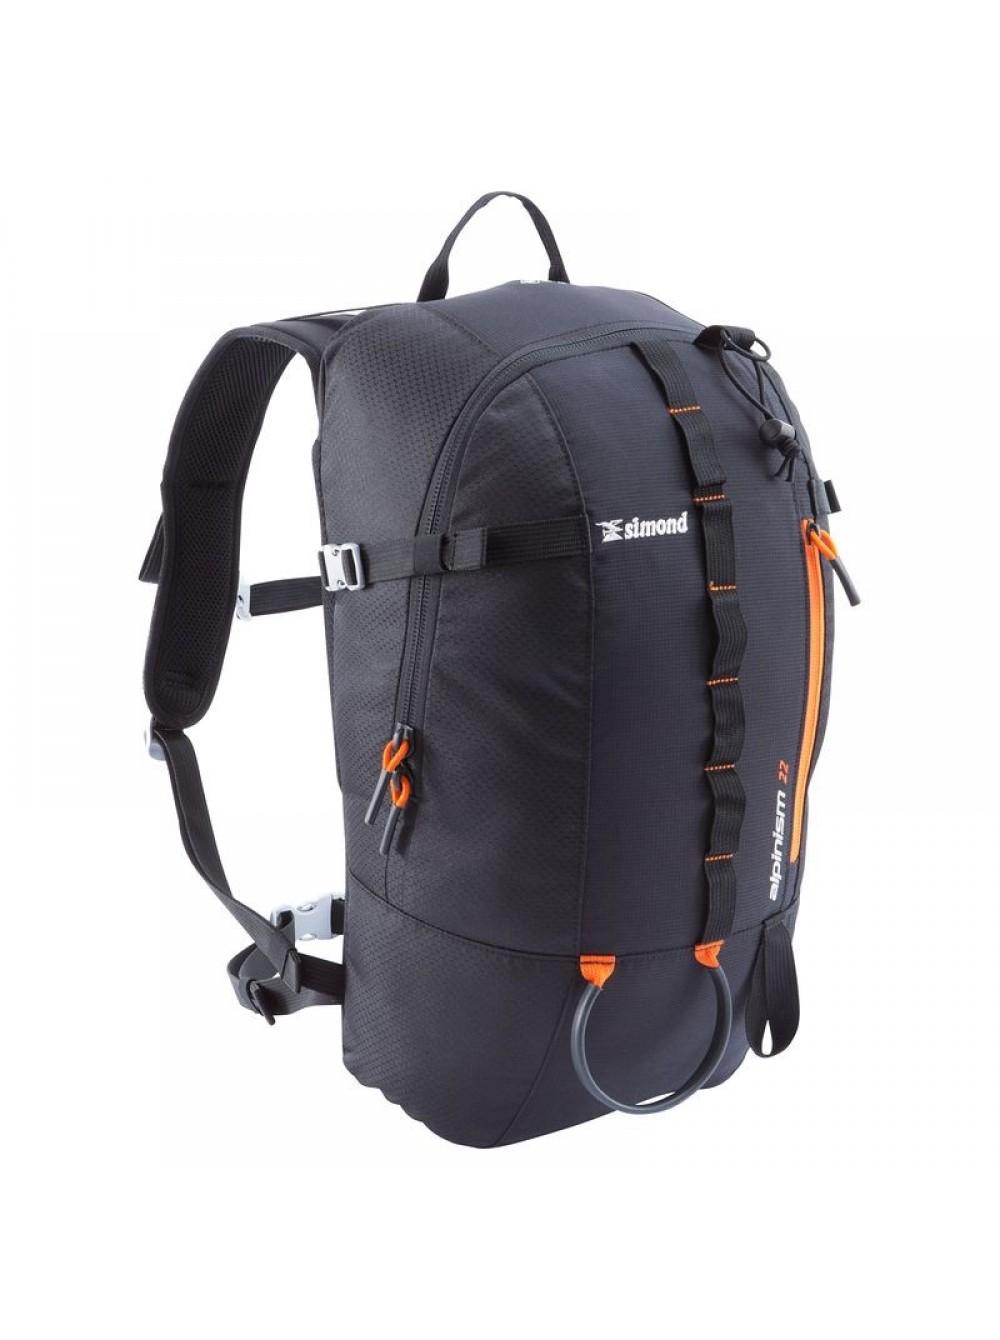 Simond рюкзак alpinism 22 рюкзак поводок для ребенка